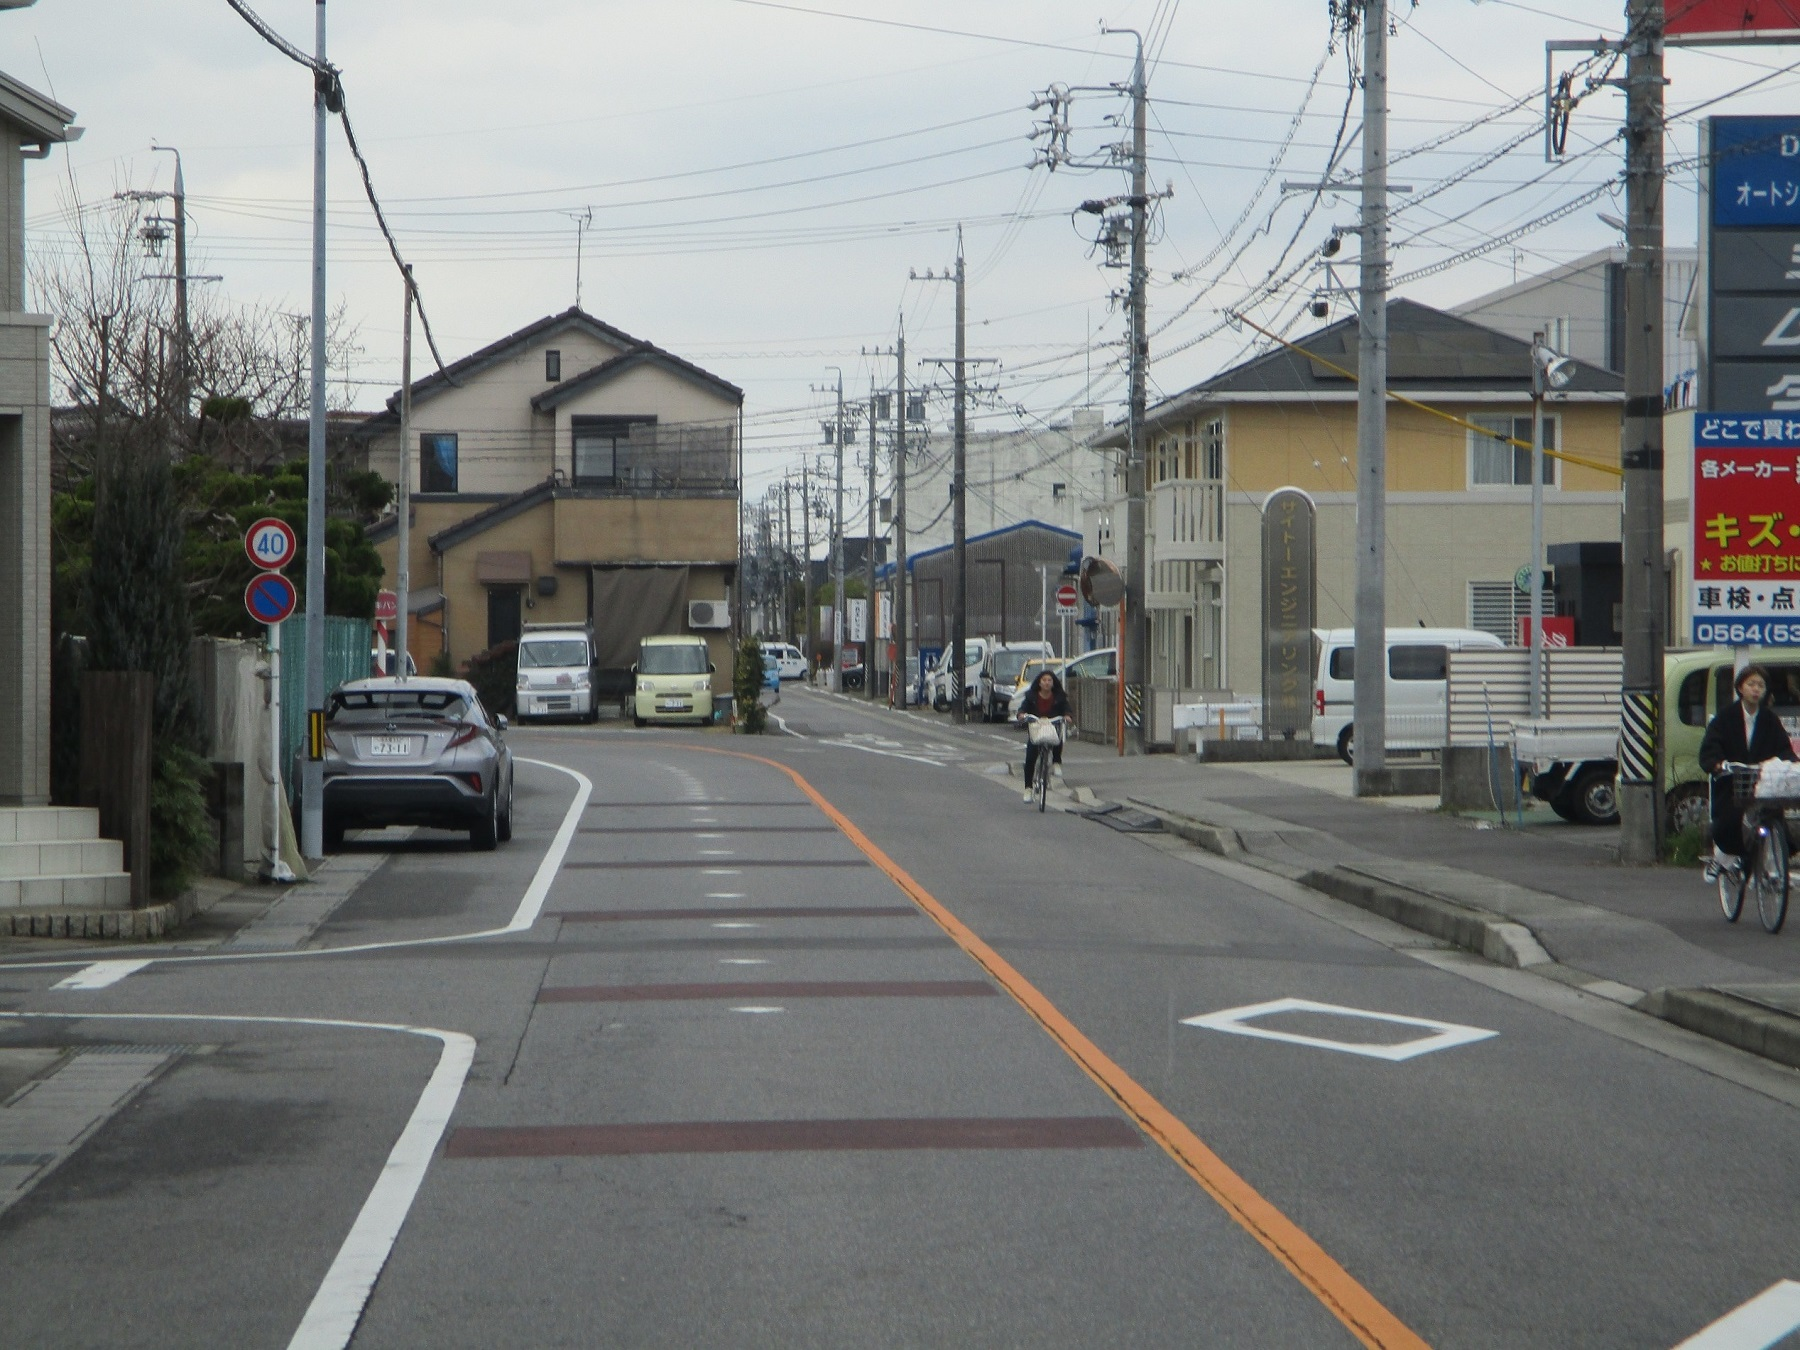 2020.2.26 (22) JR岡崎駅西口いきバス - バス停間 1800-1350